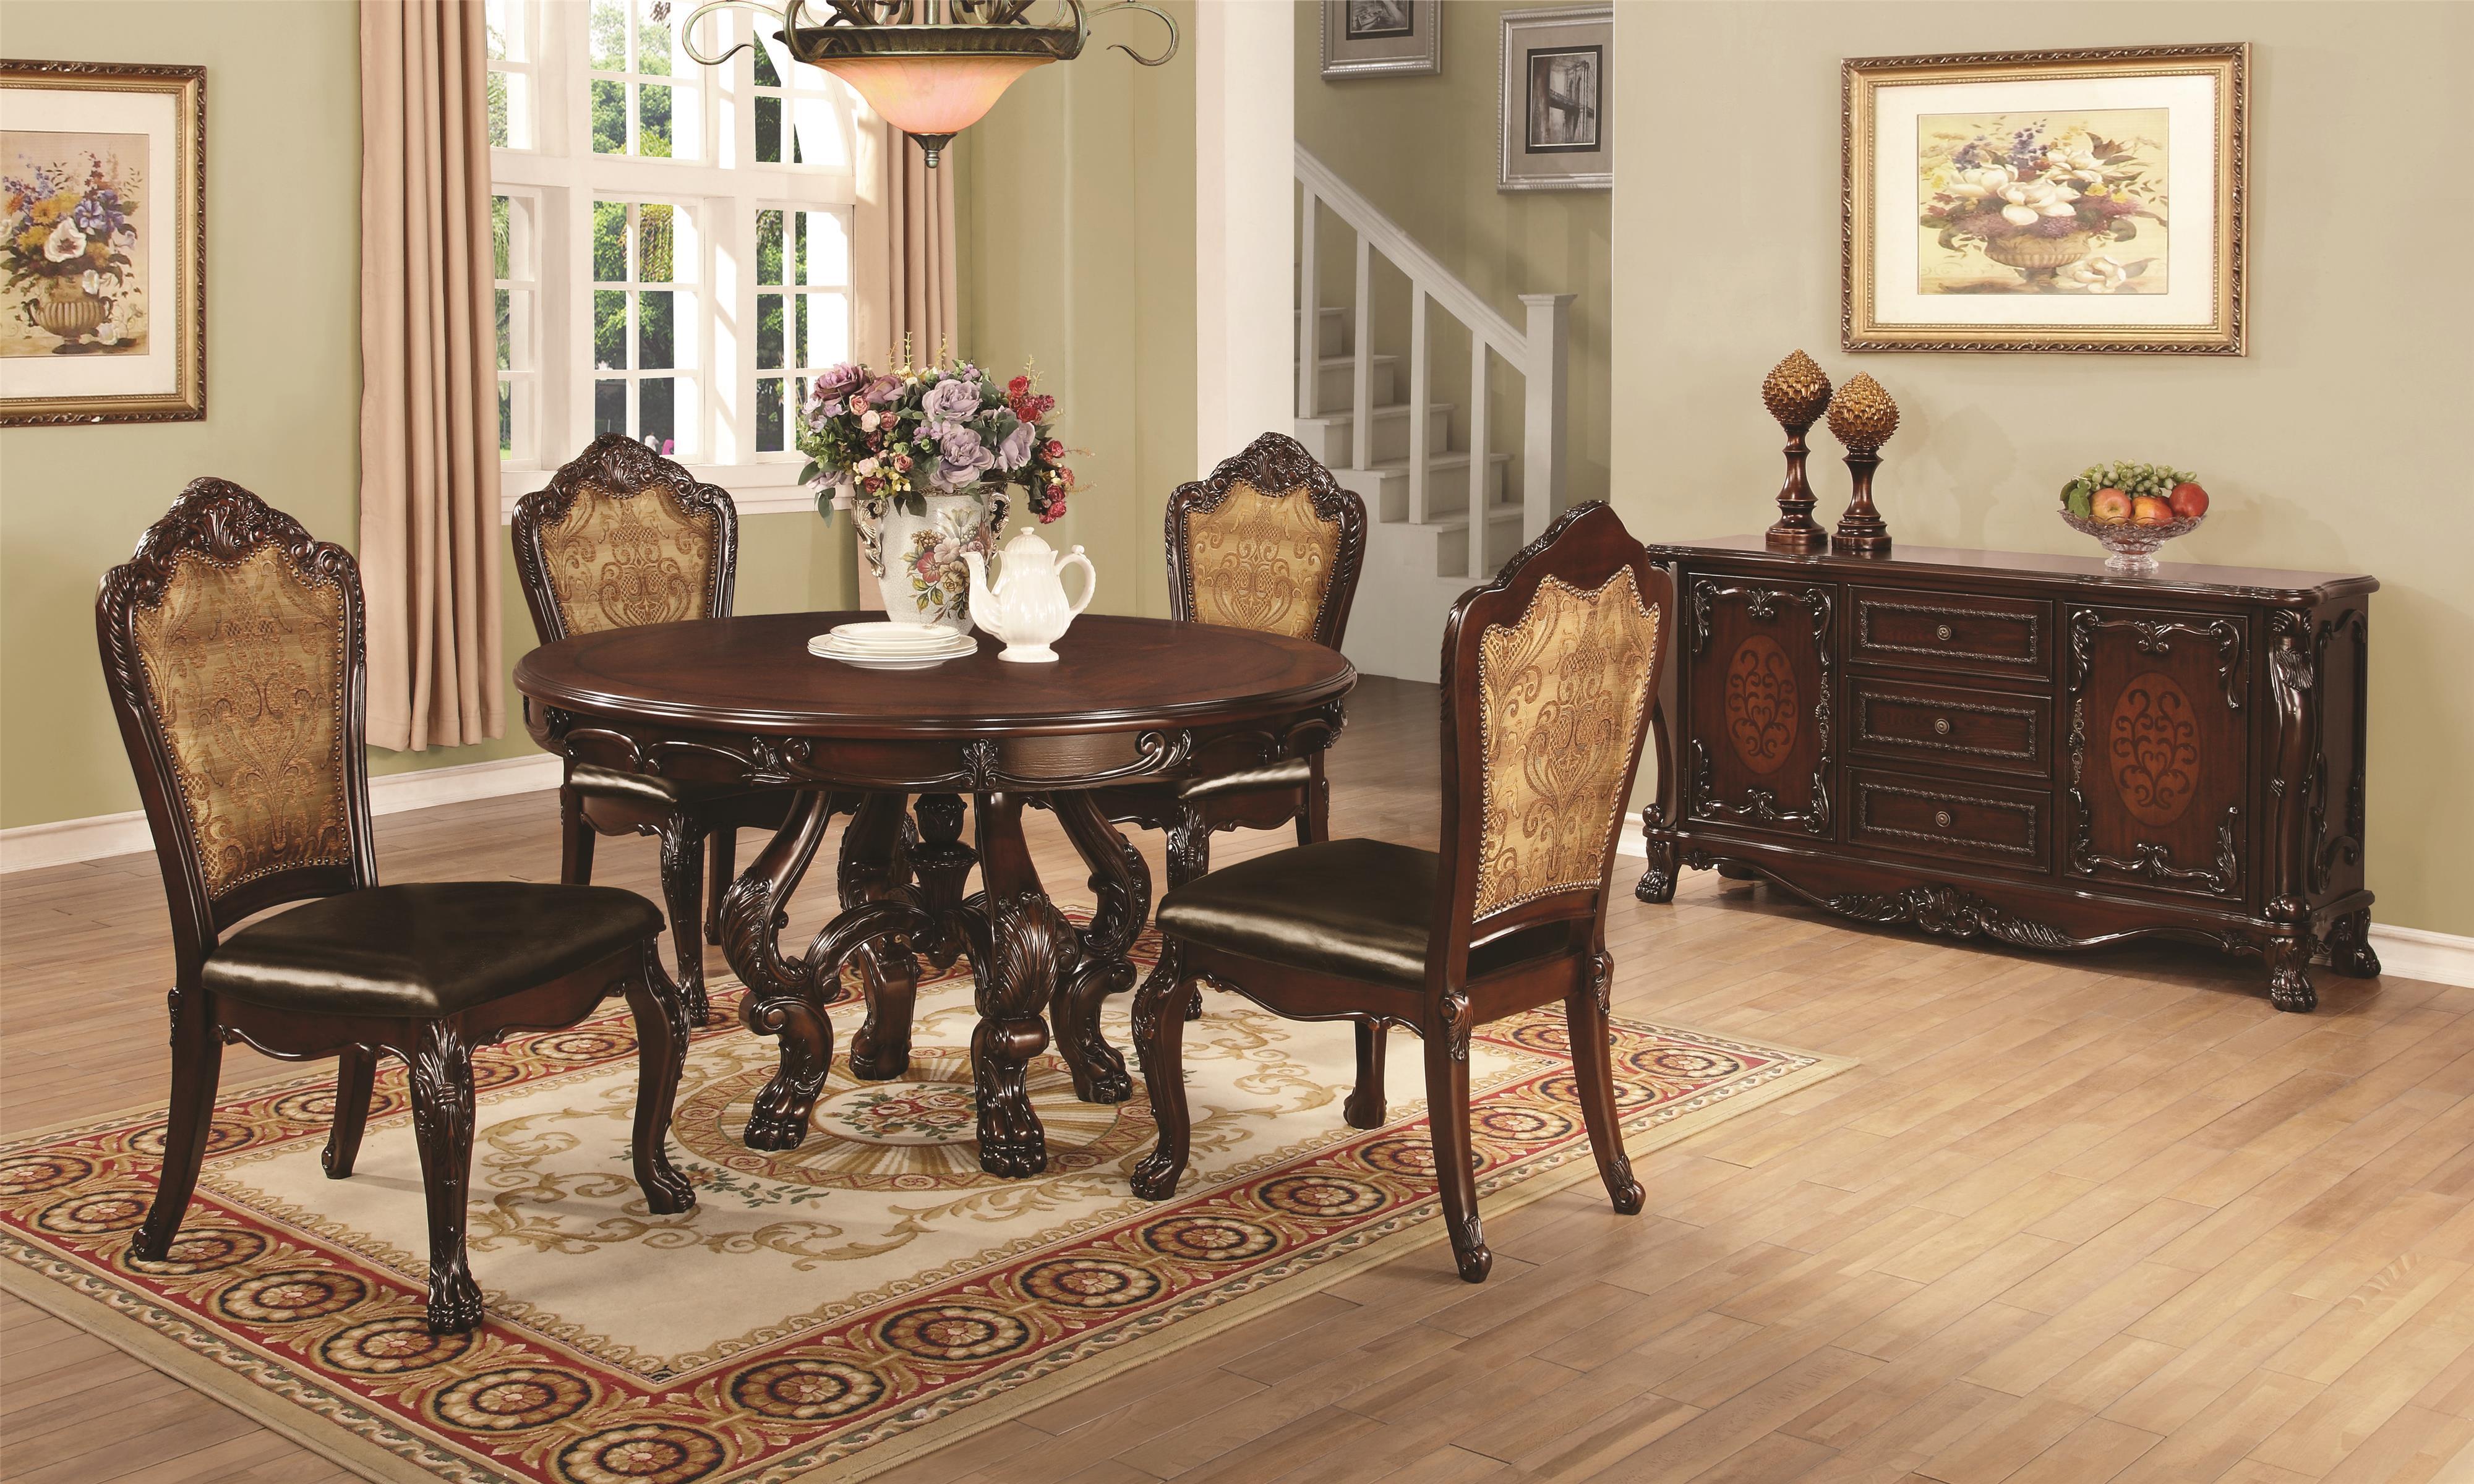 Coaster Benbrook Formal Dining Room Group - Item Number: 1055 Dining Room Group 1